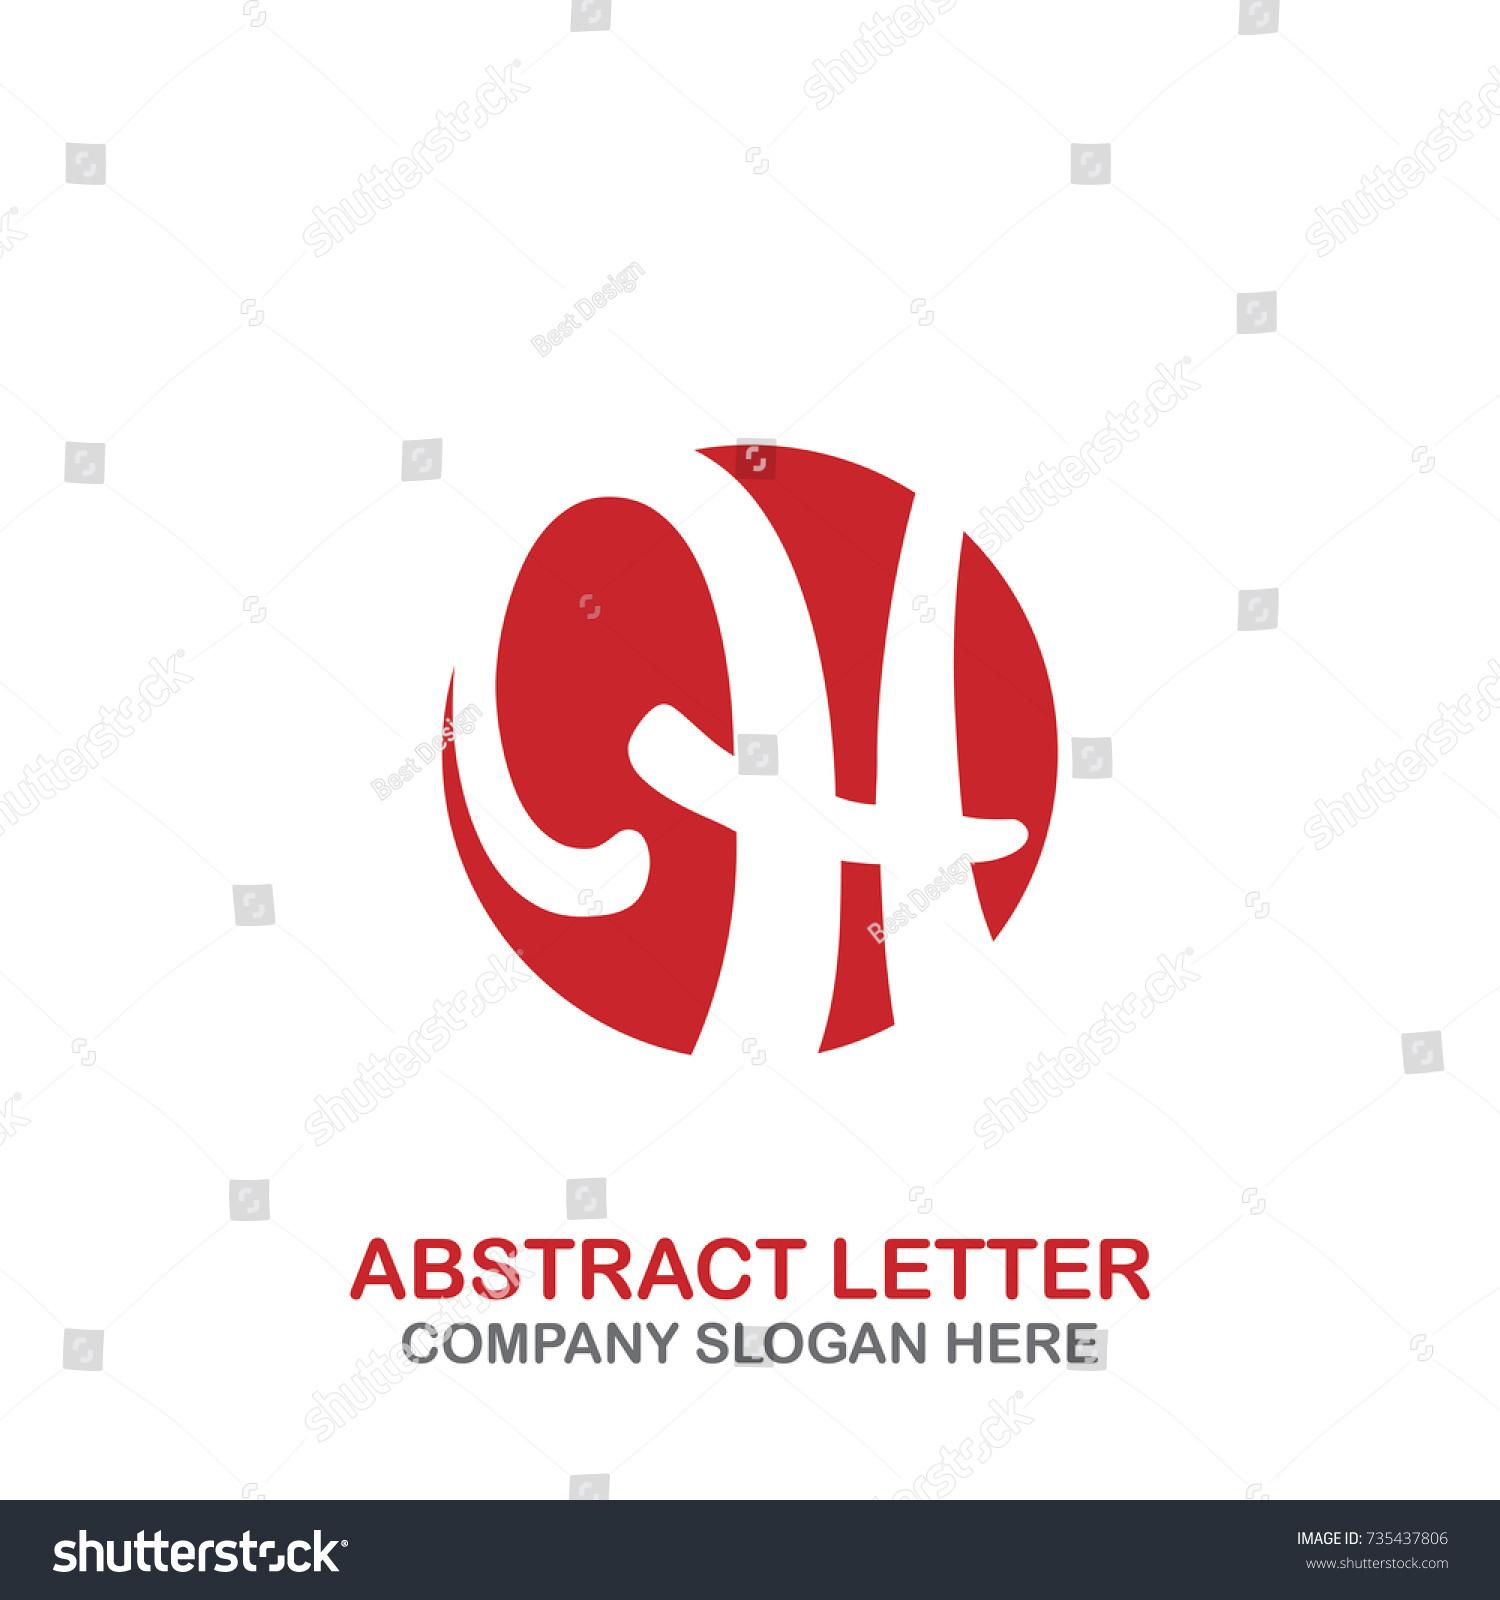 925cb3e70e Abstract Letter H Logo Circle Simple Stock Vector (Royalty Free ...